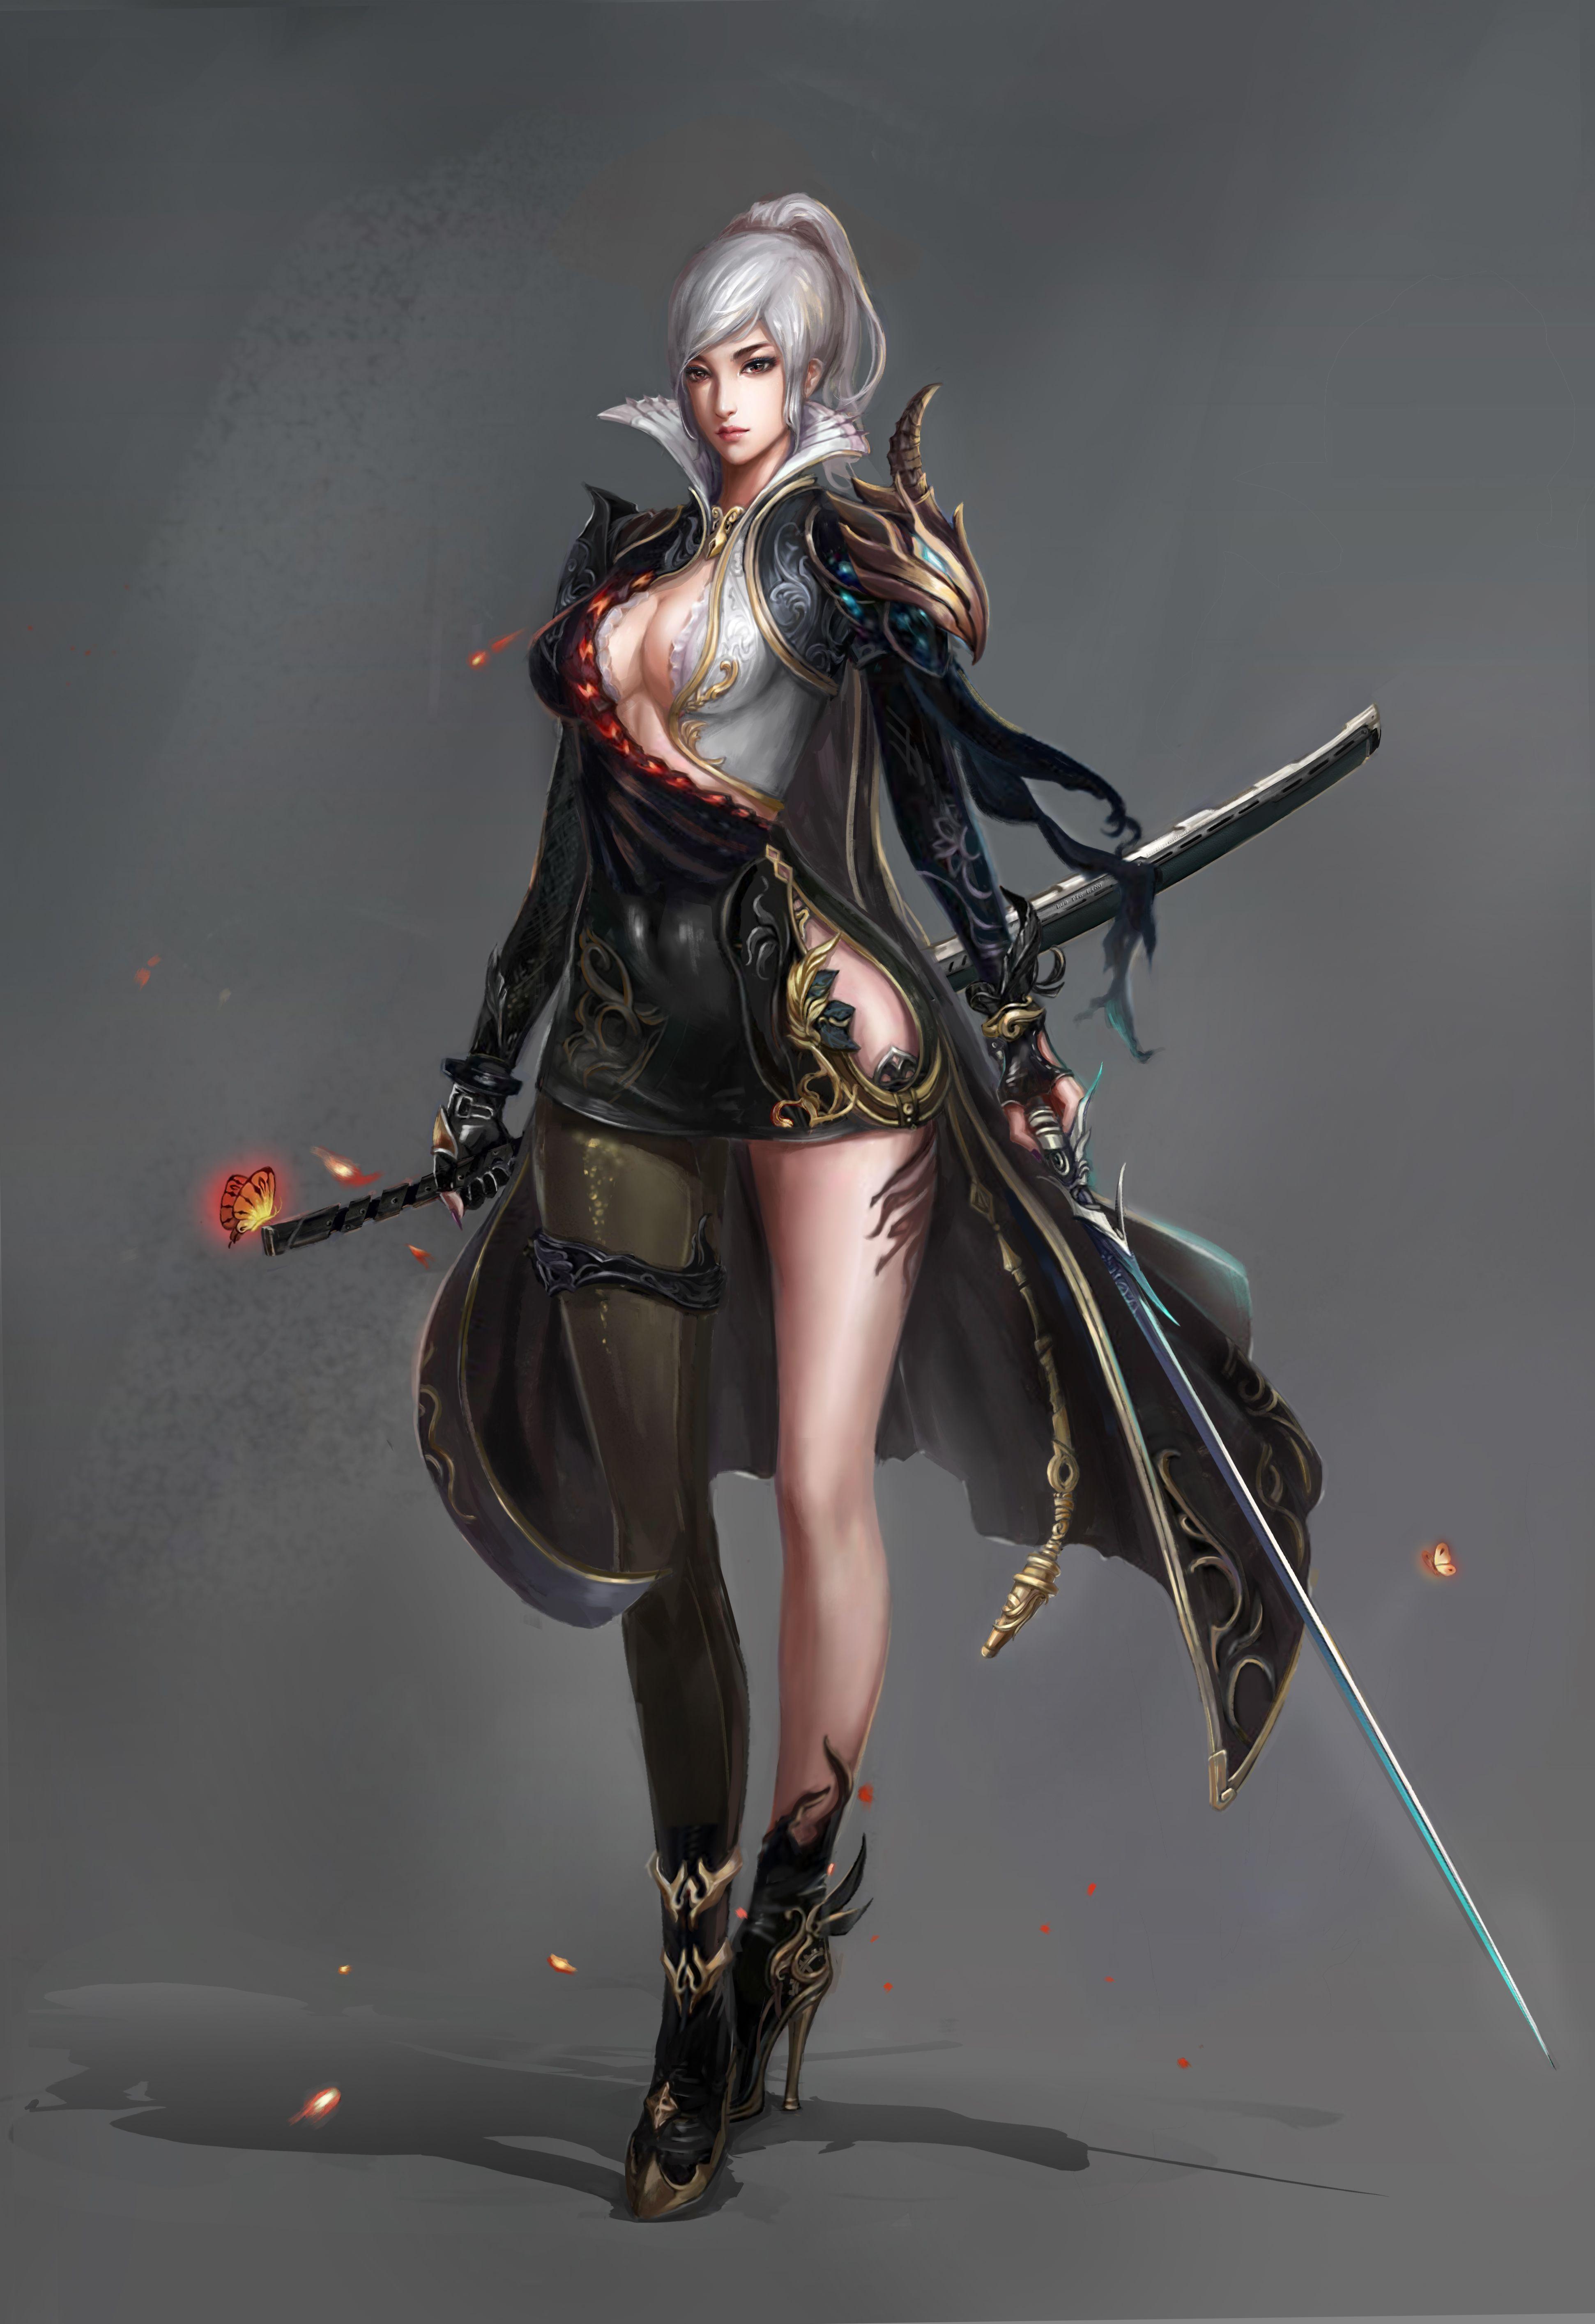 Ninja Weiblich